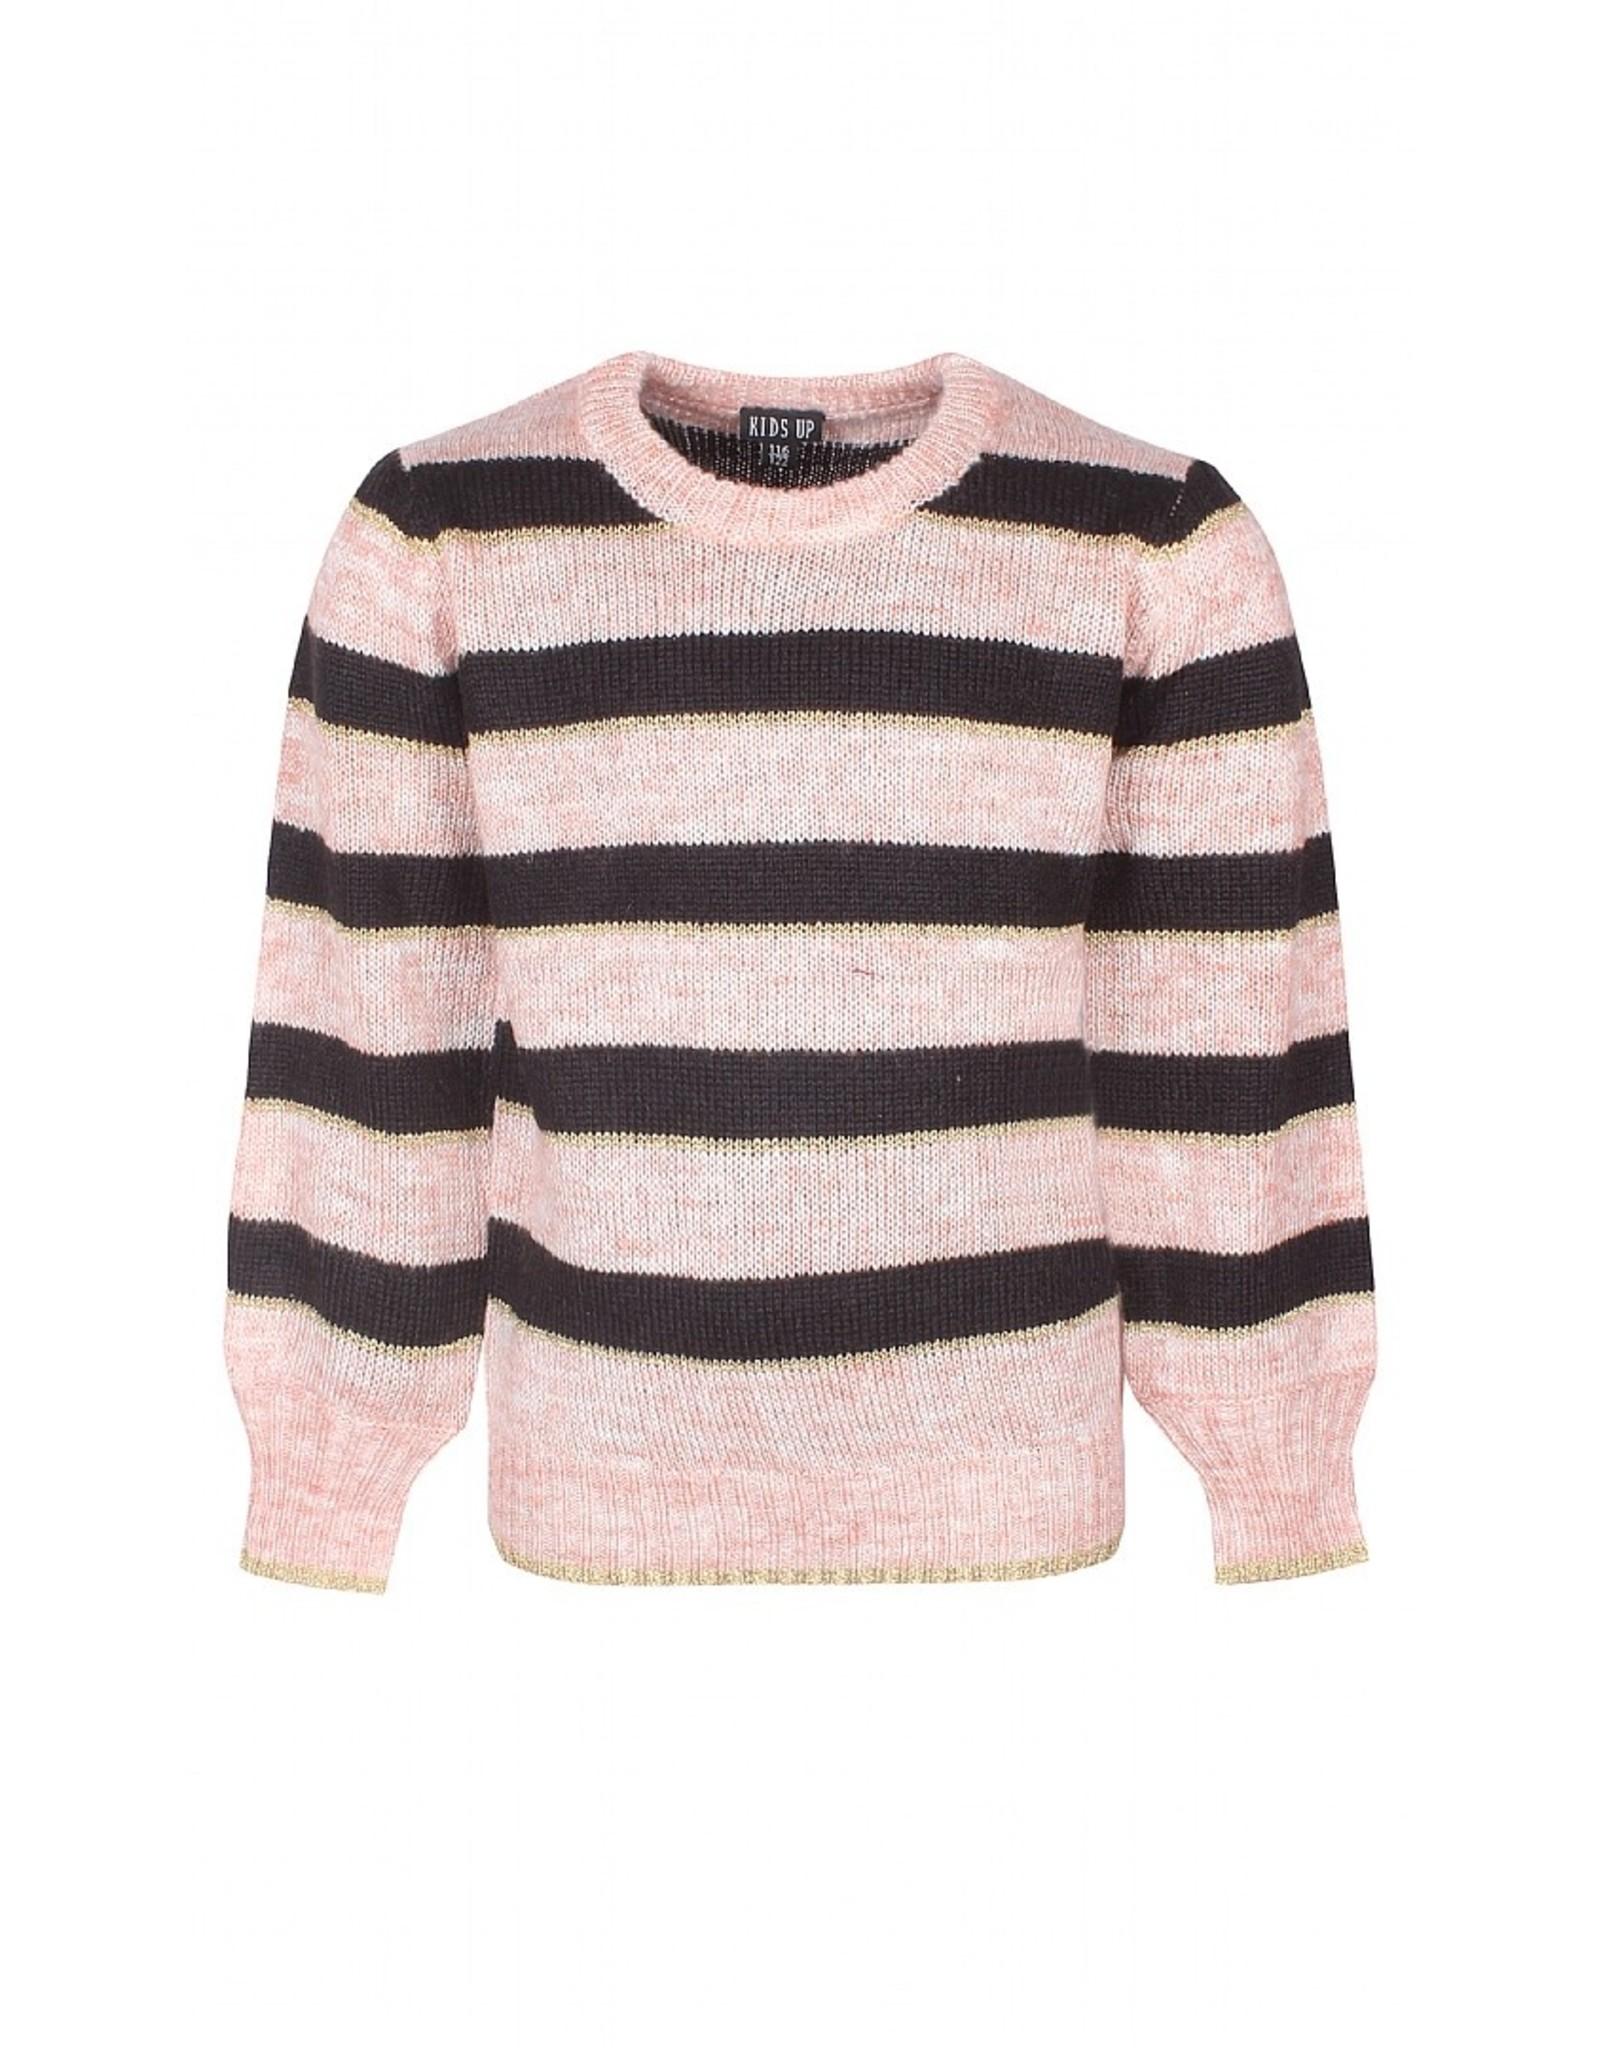 Kids Up Knit Pullover Ilma